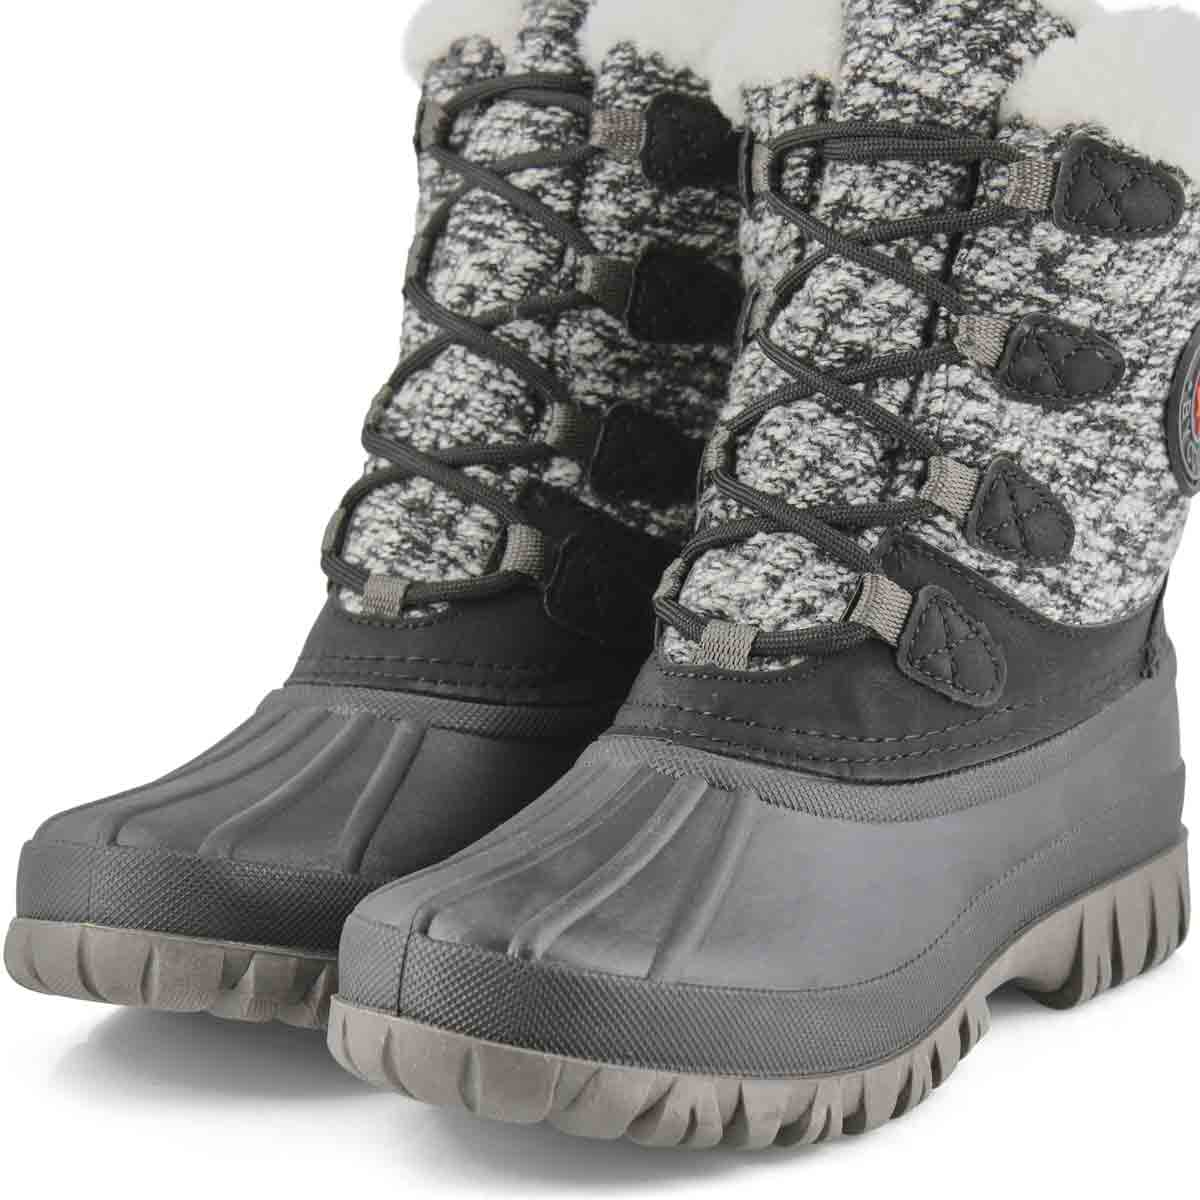 Women's CAMP blk/wht waterproof winter boots